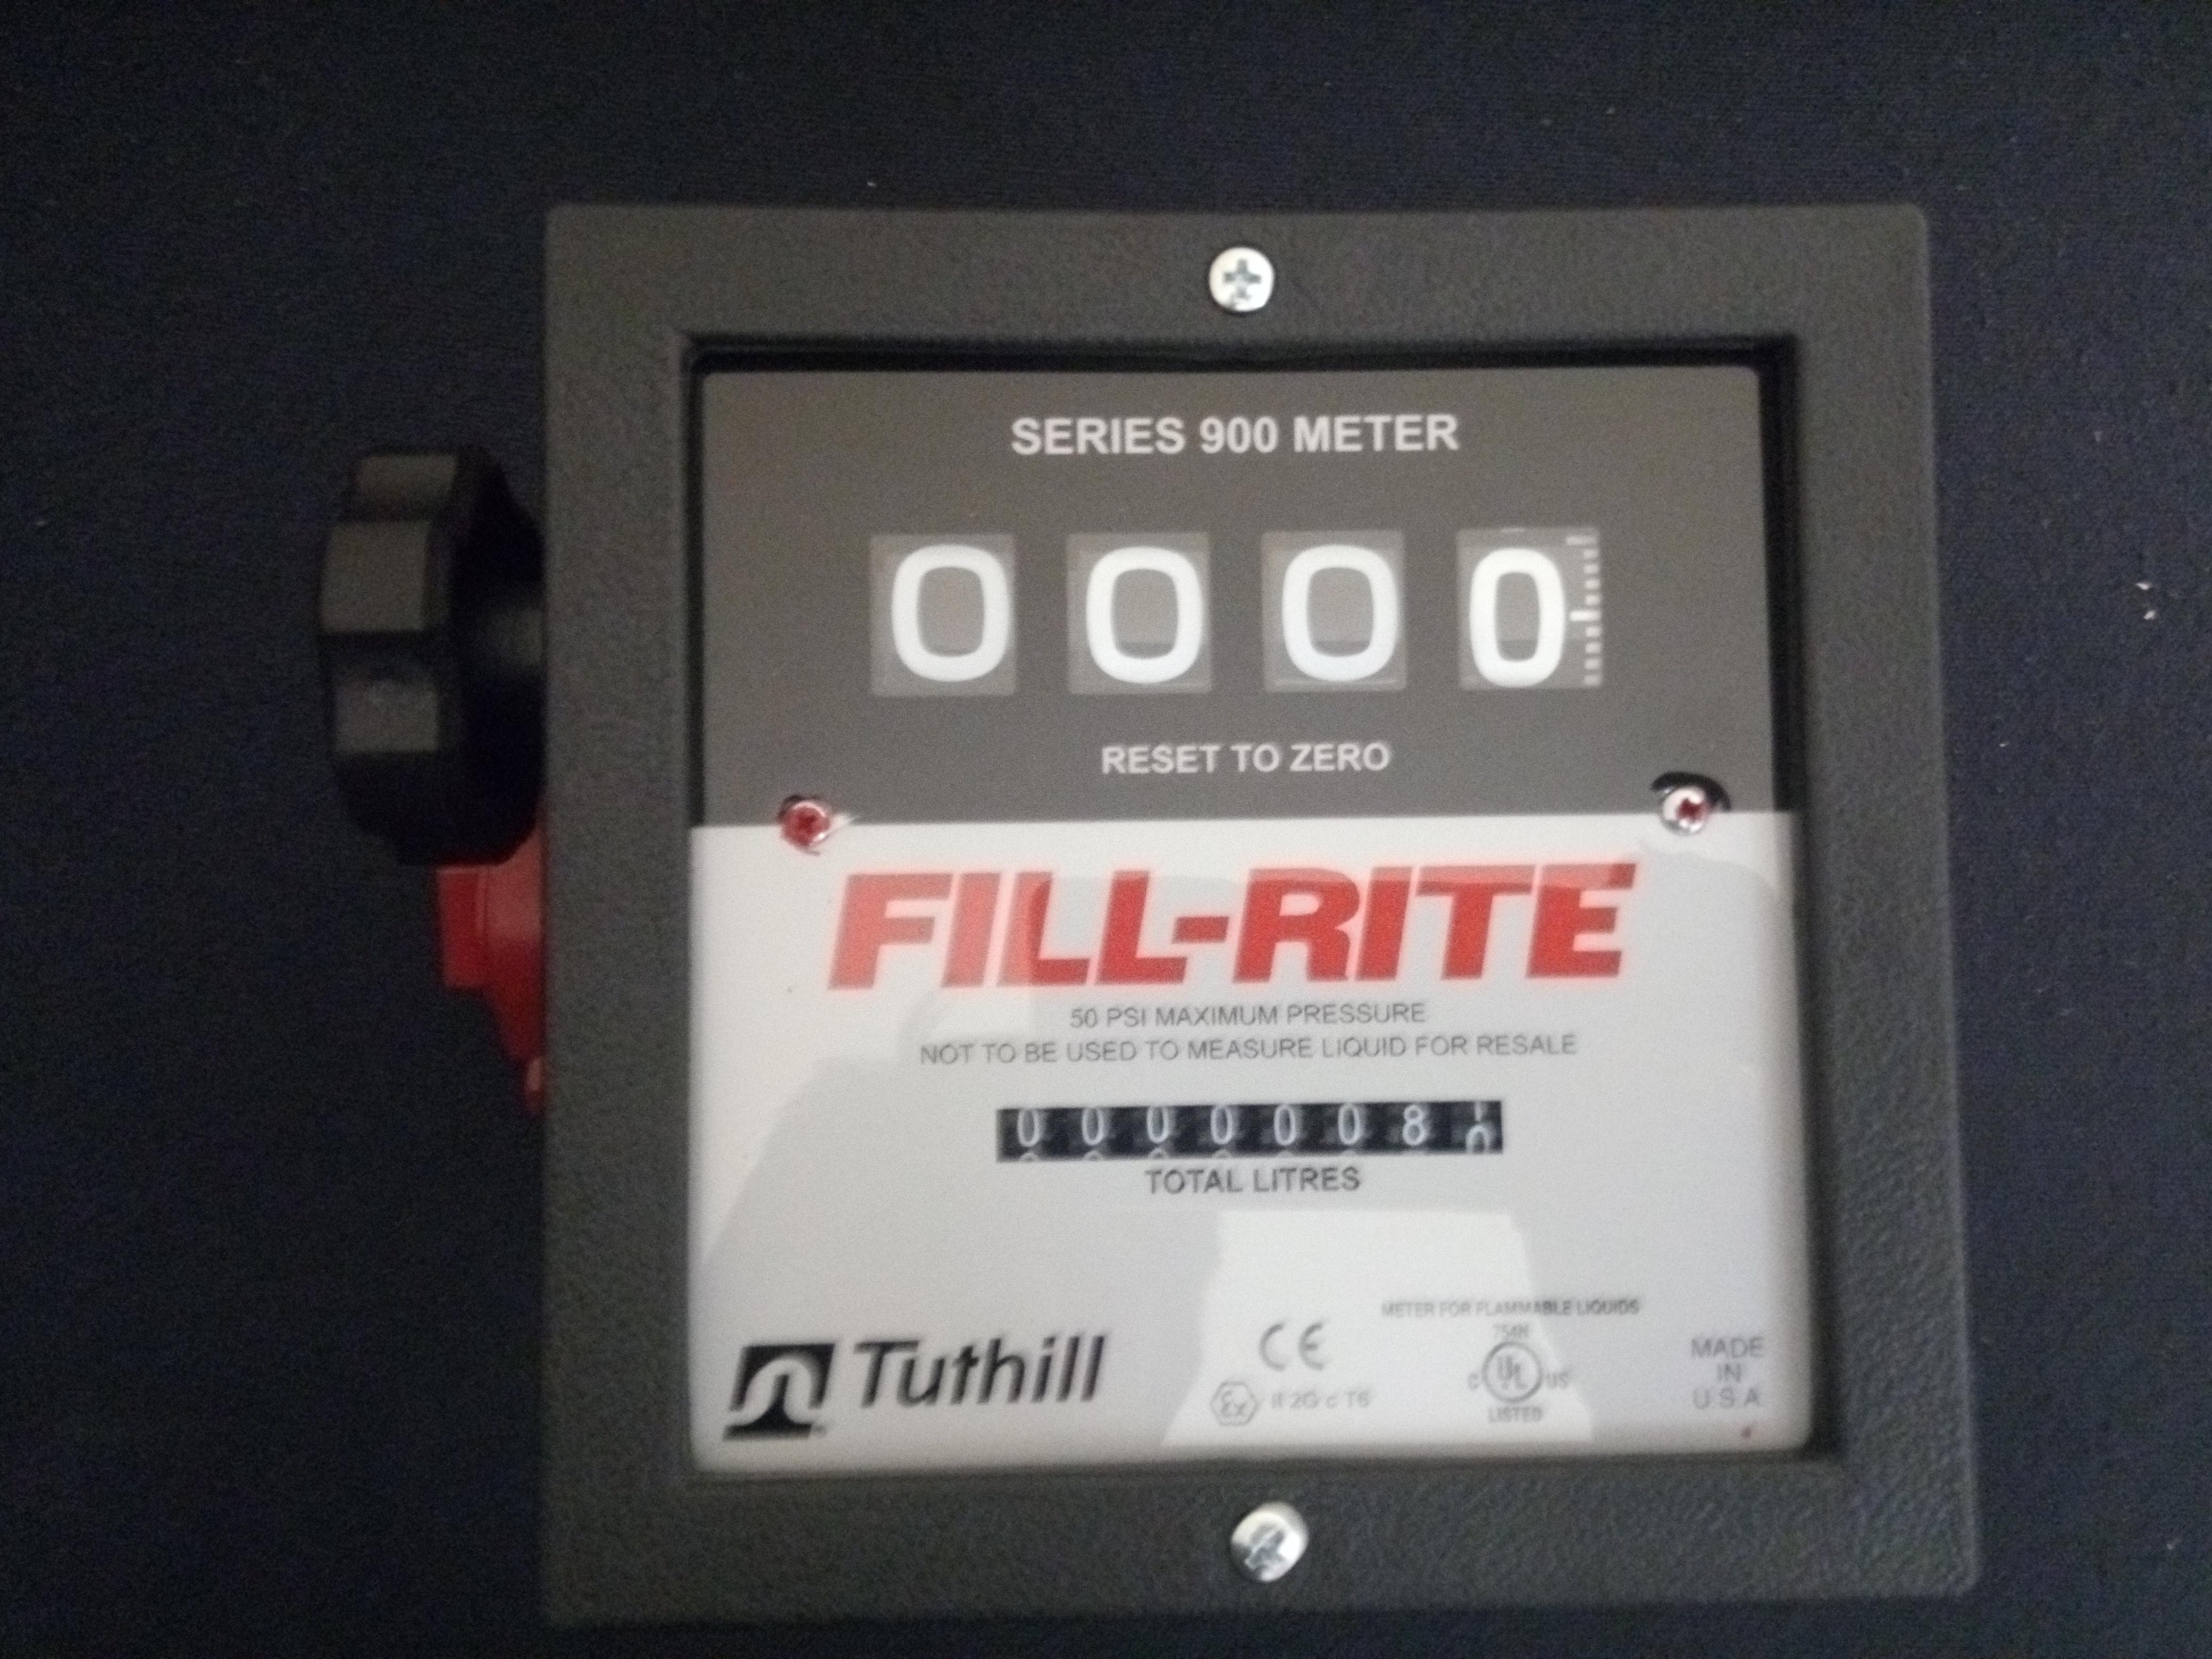 FILLRITE MECHANICAL 4 DIGIT FLOW METER / FR901 SERIES